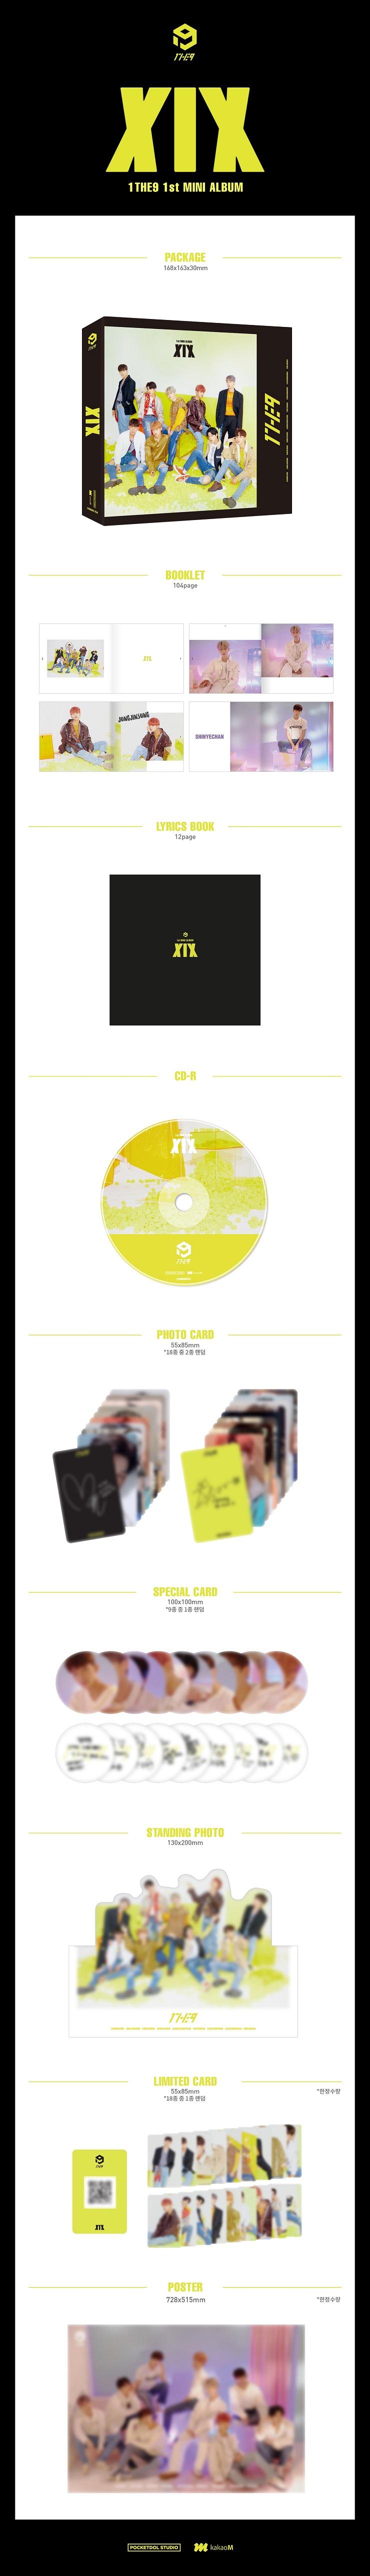 1THE9(원더나인) - XIX